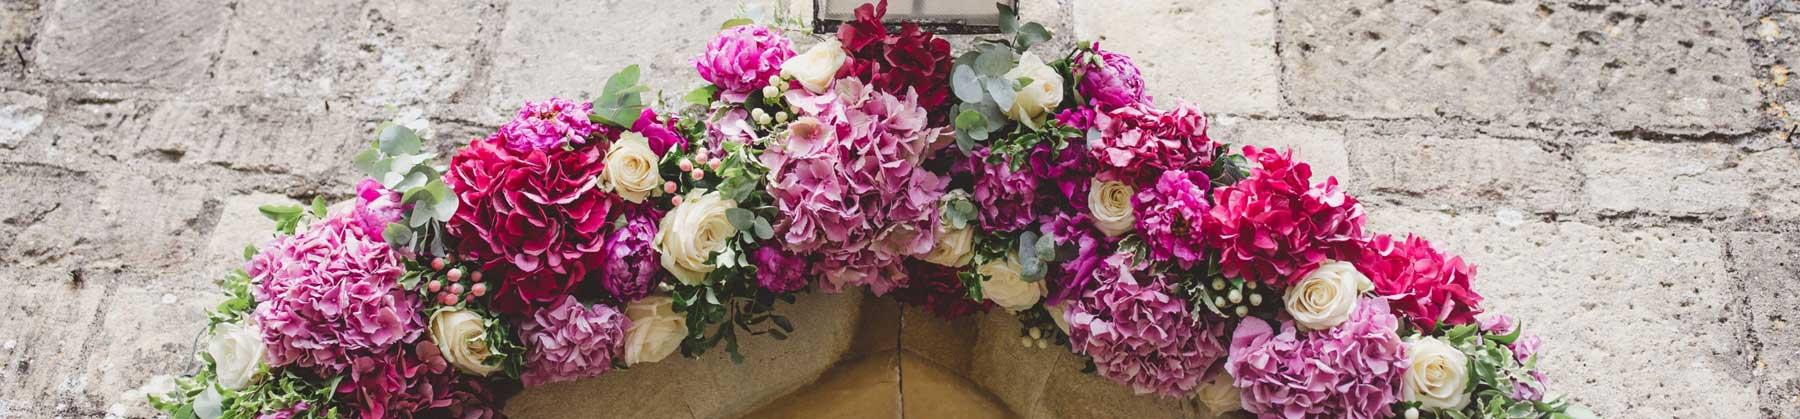 floristry for weddings